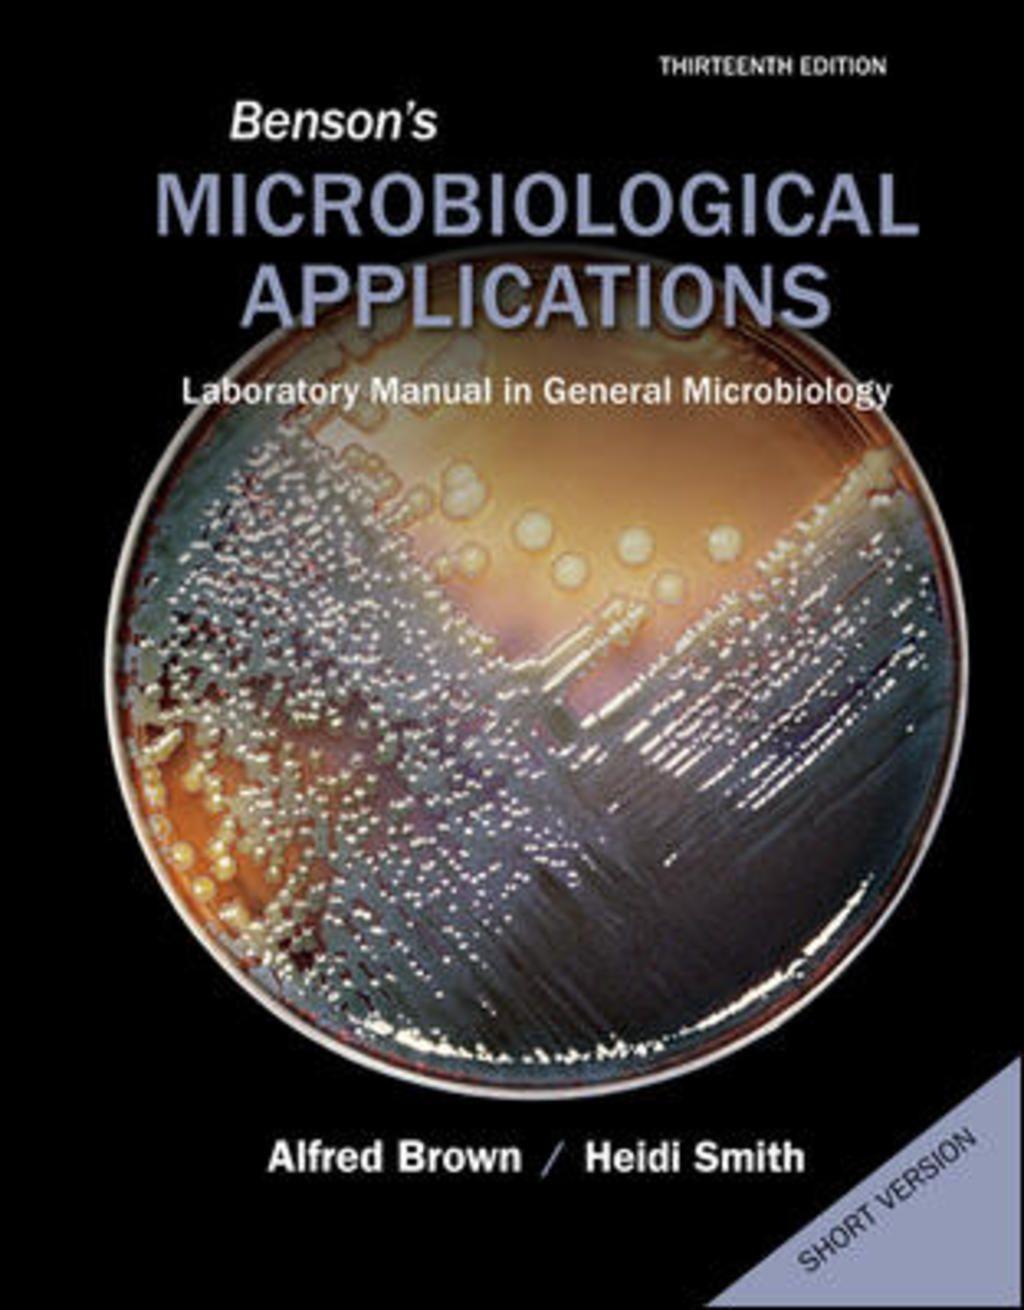 Benson S Microbiological Applications Short Version Ebook